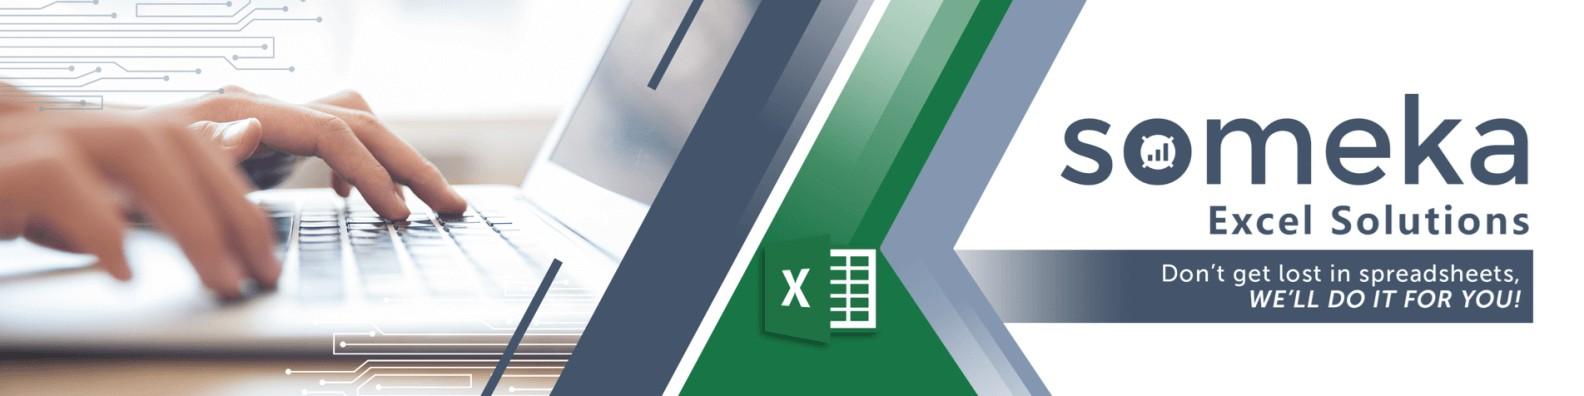 Someka Excel Solutions | LinkedIn